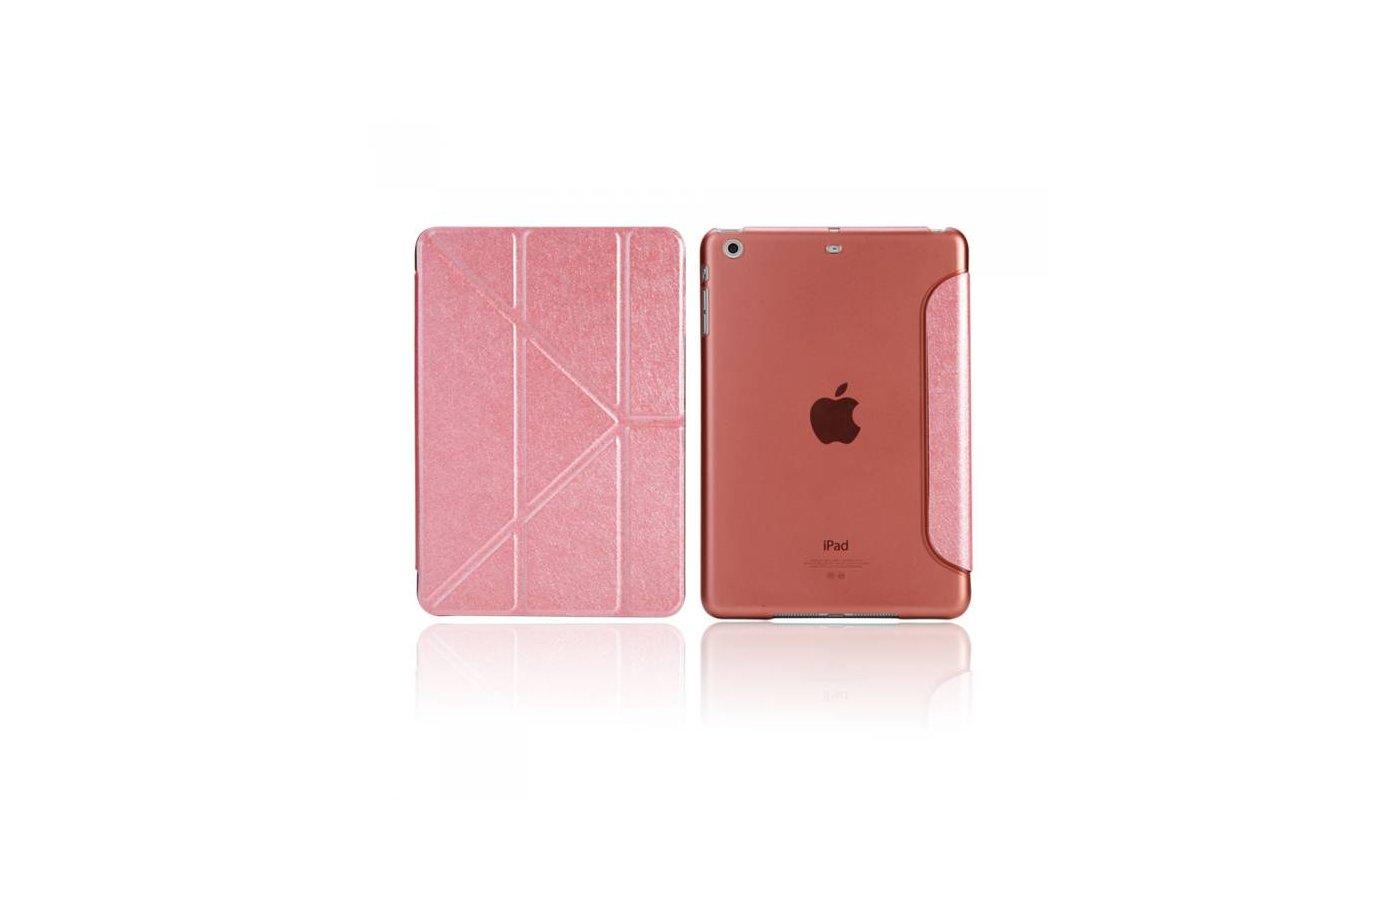 Чехол для планшетного ПК IT BAGGAGE для iPad Mini Retina/ iPad mini 3 hard case иск.кожа персиковый пленка ITIPMINI01-3